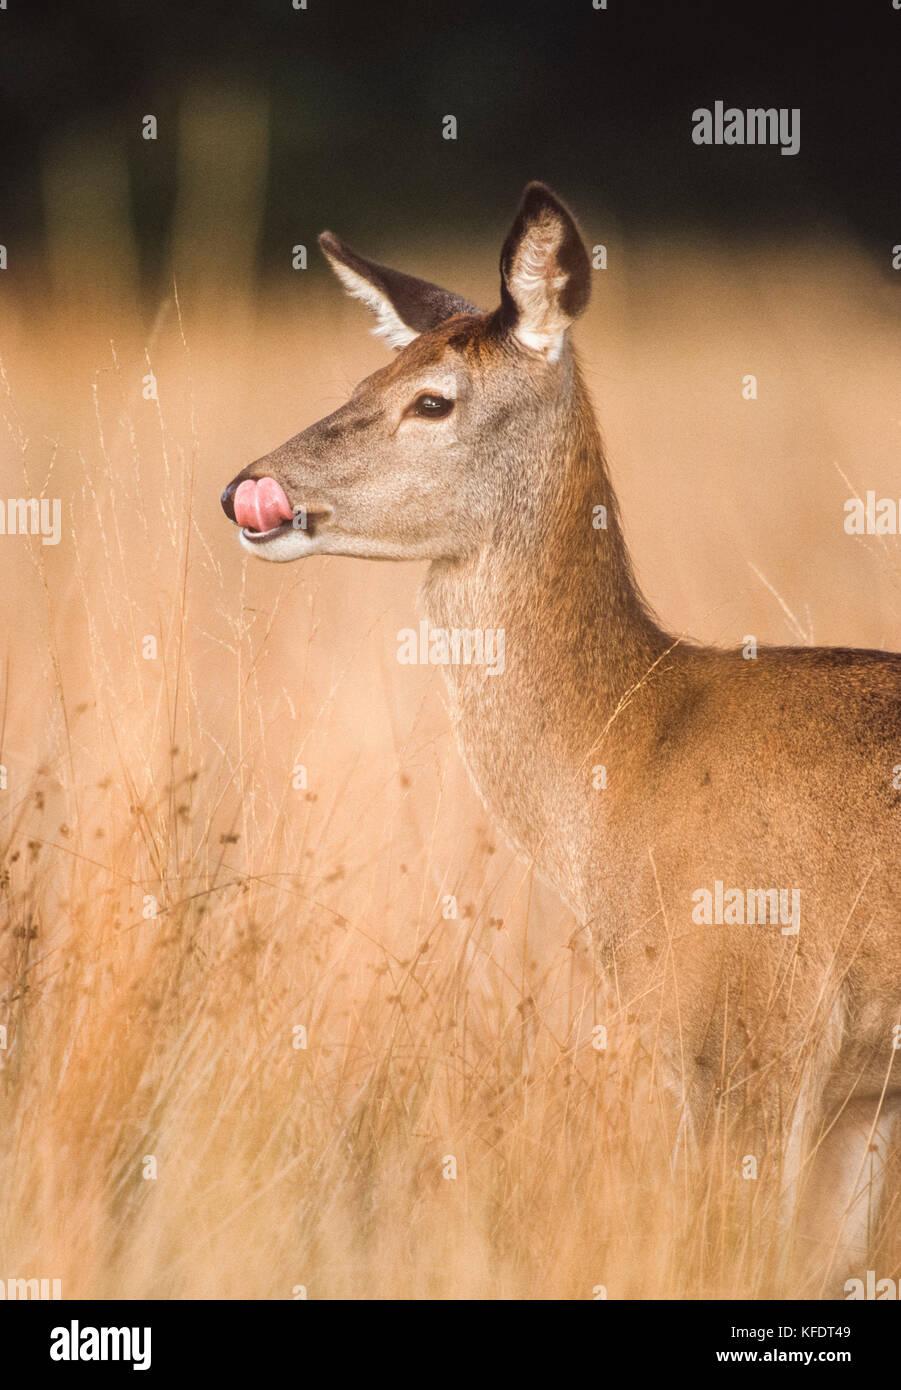 female Red Deer, (Cervus elaphus), hind standing in grasses licking nose during autumn season, Richmond Park, London, - Stock Image